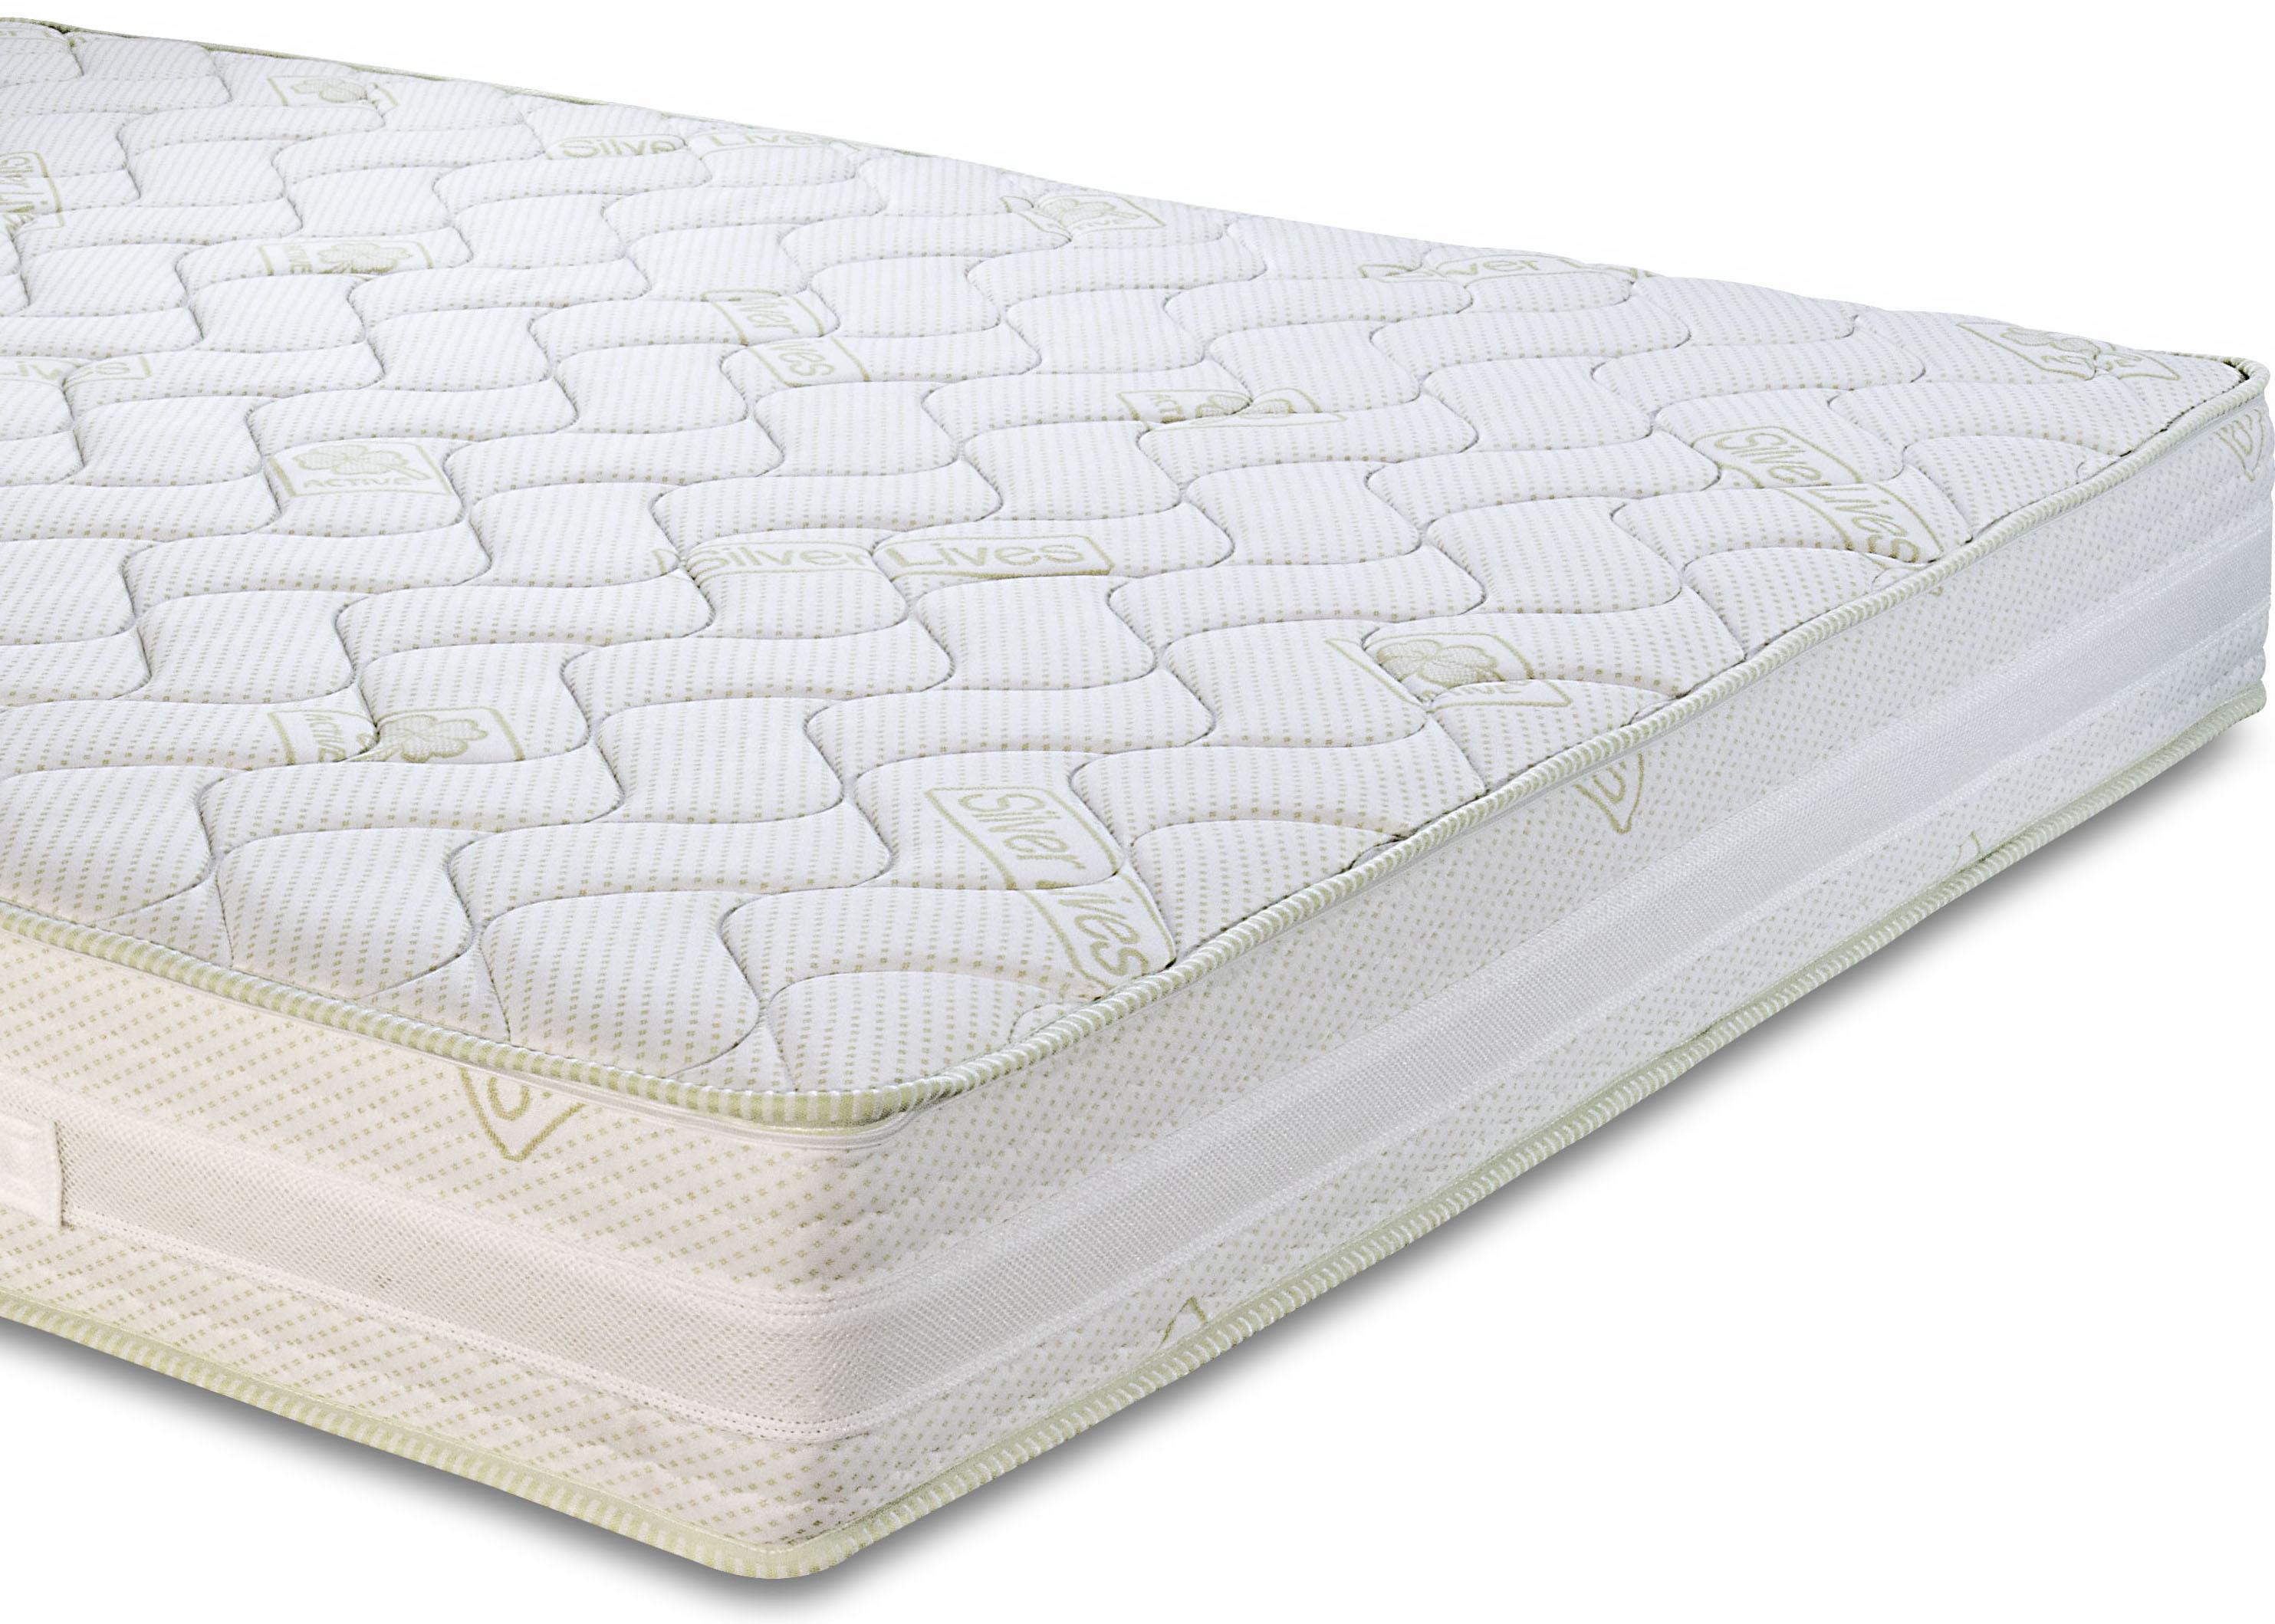 matelas en mousse a memoire de forme h 21 silver confort onda 3. Black Bedroom Furniture Sets. Home Design Ideas